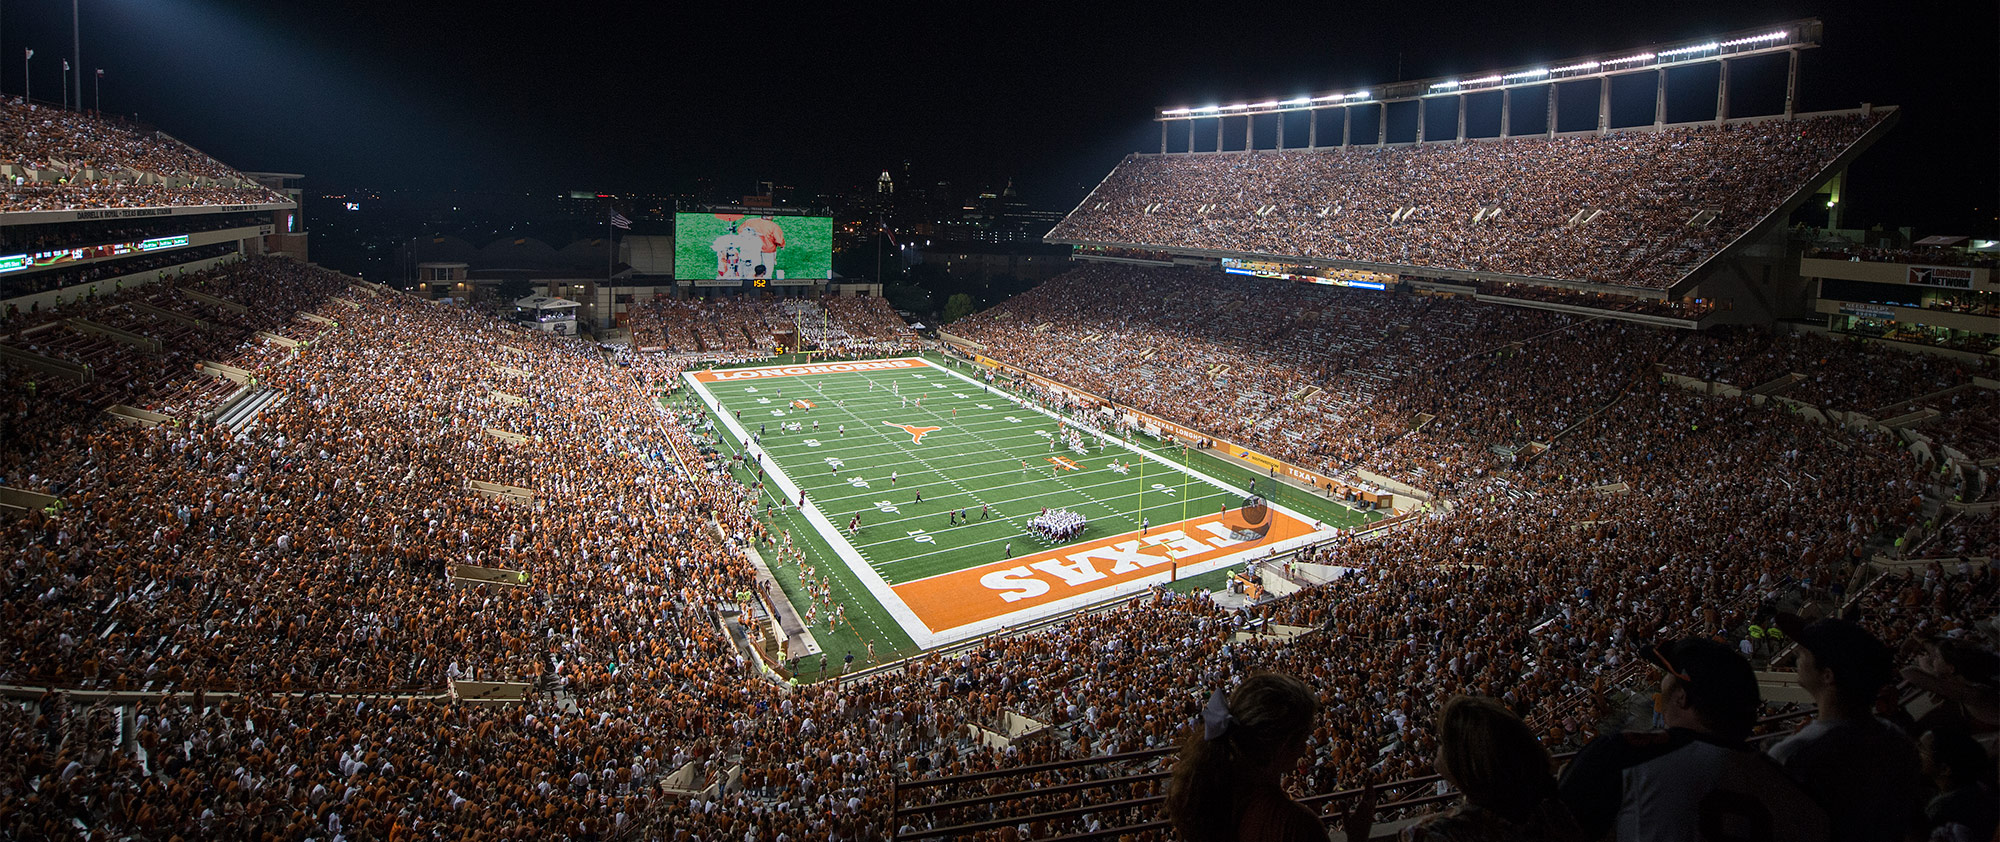 Photo: texassports.com